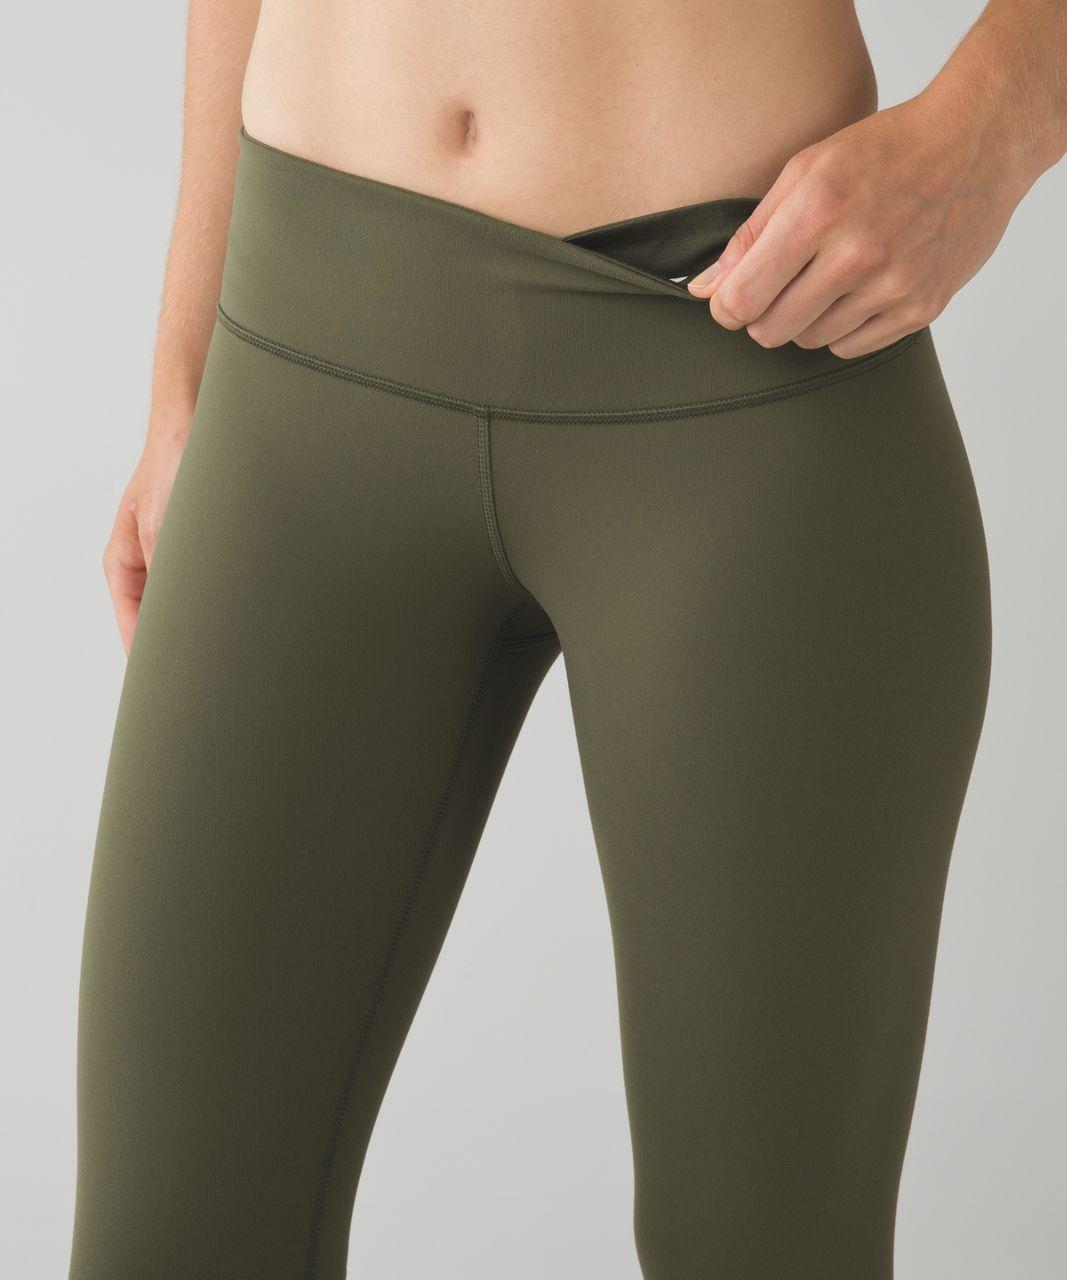 Lululemon Wunder Under Pant *Full-On Luon - Fatigue Green